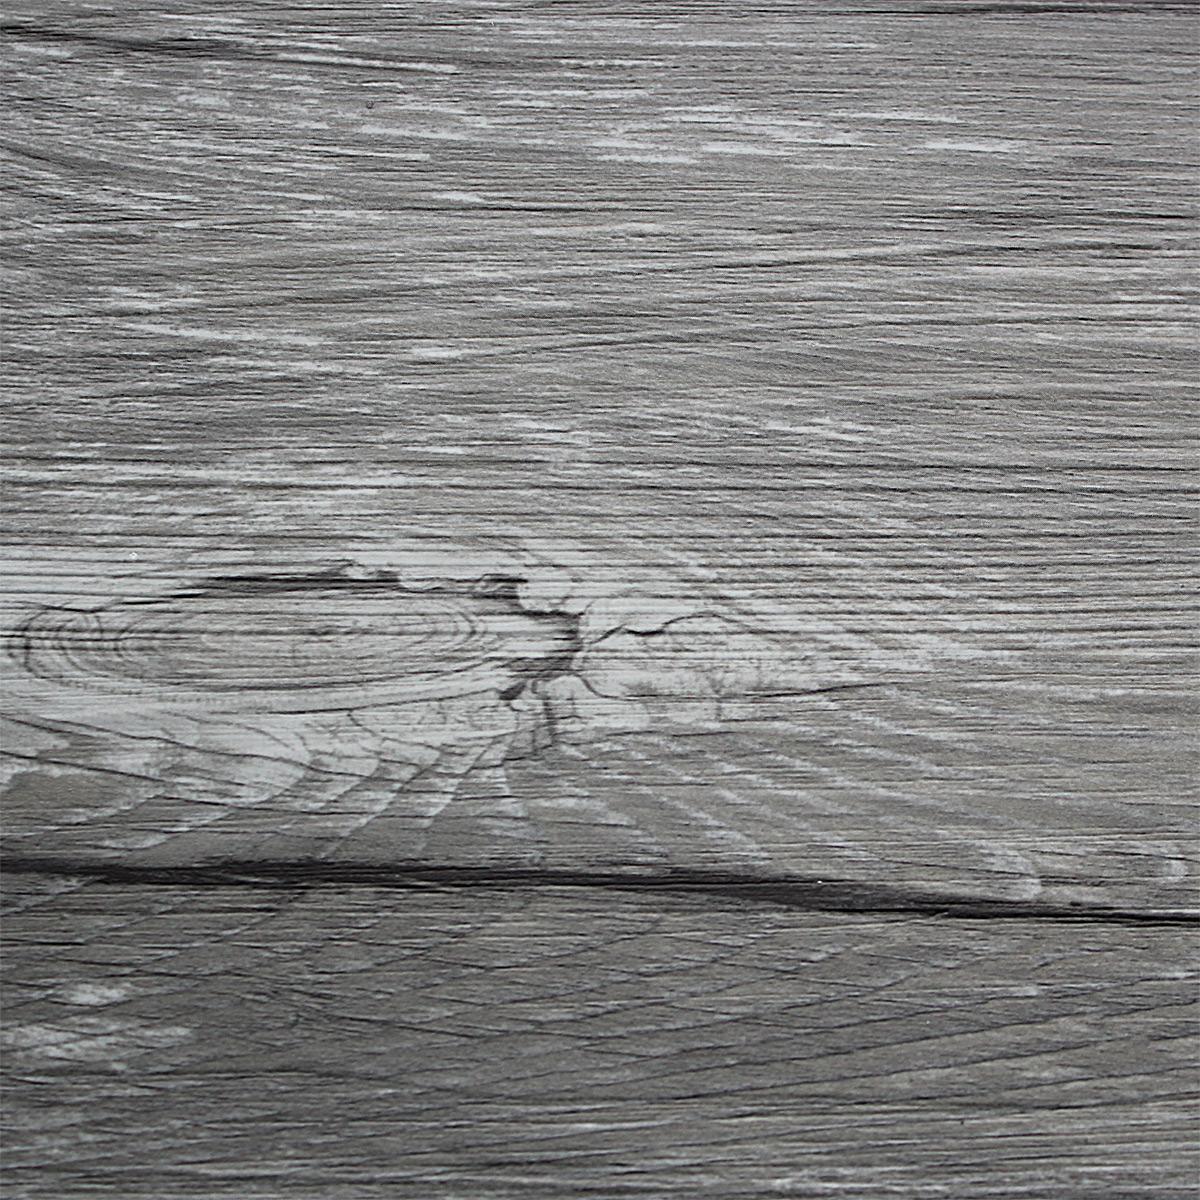 neuholz 20 08 m vinyl laminate flooring planks oak white wash vinyl gray. Black Bedroom Furniture Sets. Home Design Ideas